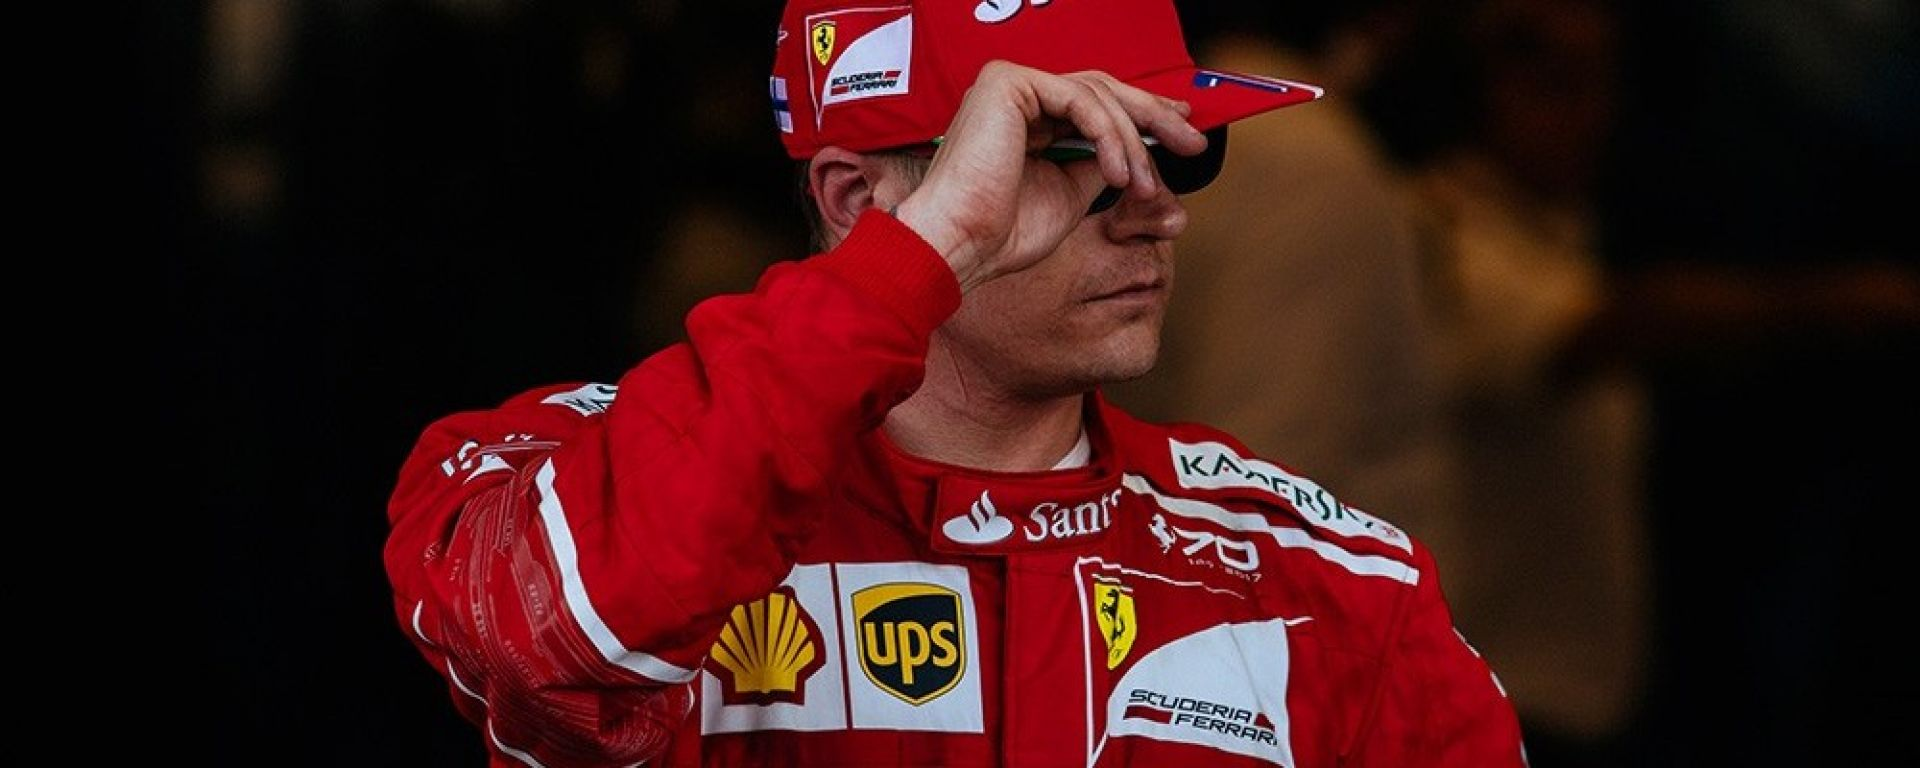 F1 2017 GP Austria, Kimi Raikkonen